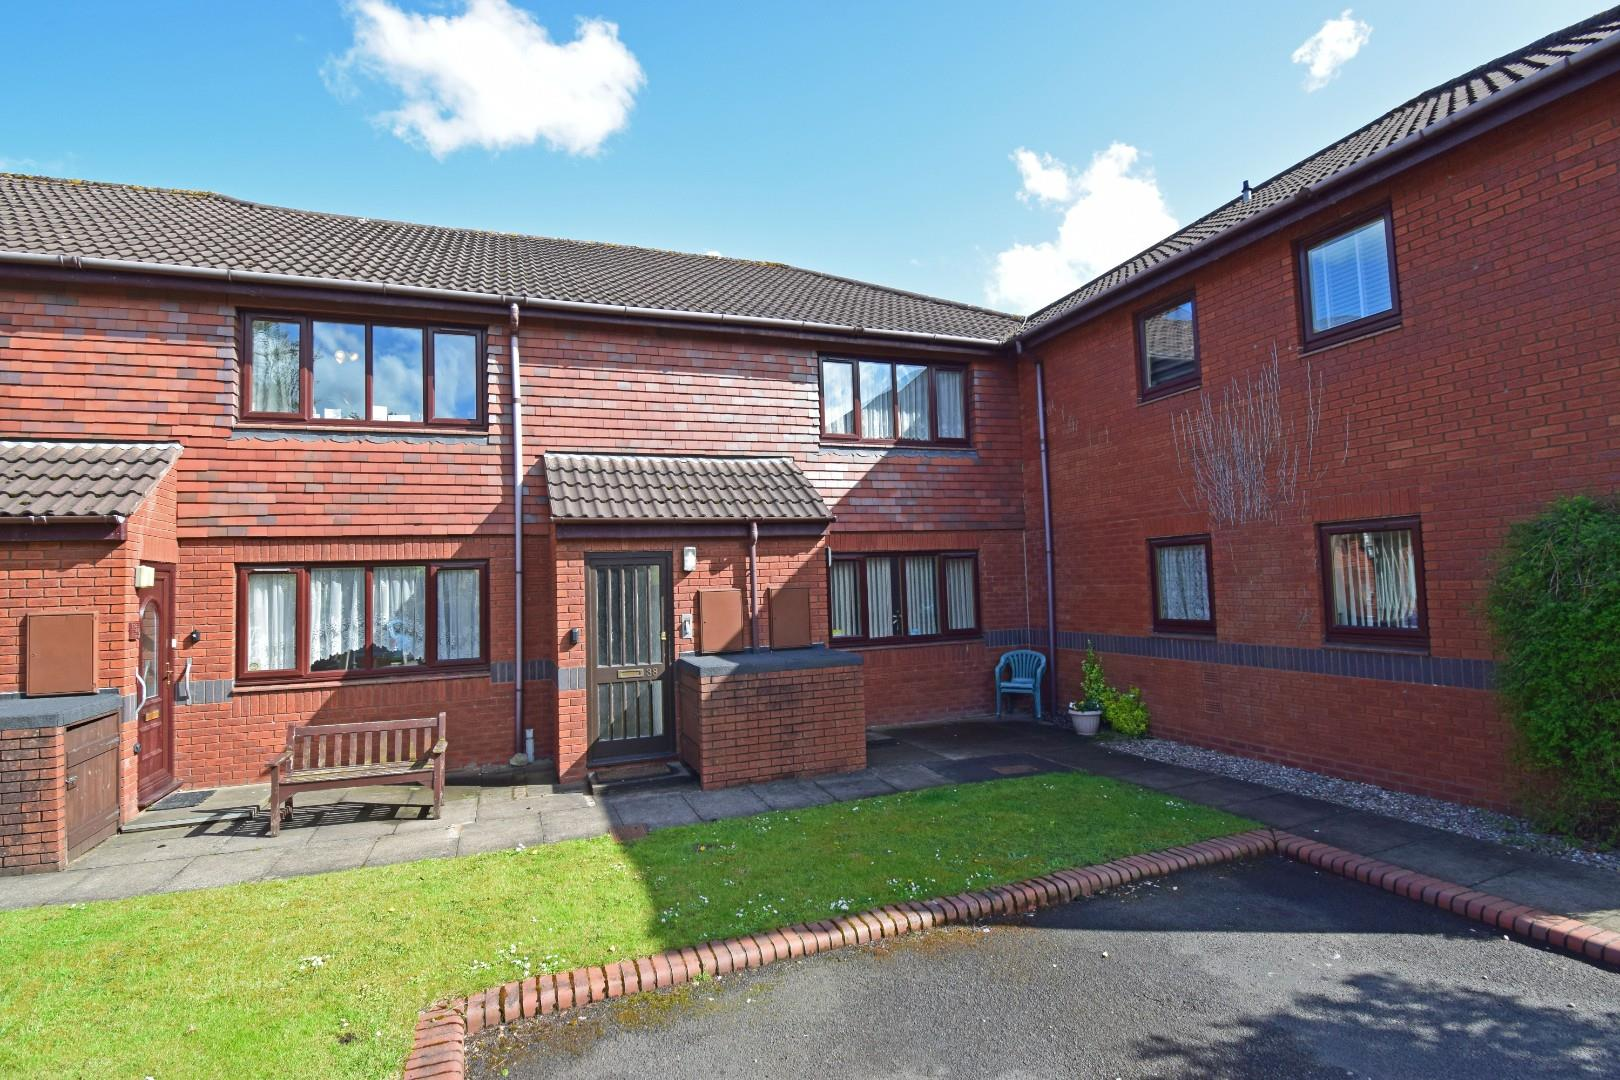 38 Housman Park, Bromsgrove, Worcestershire, B60 1AZ